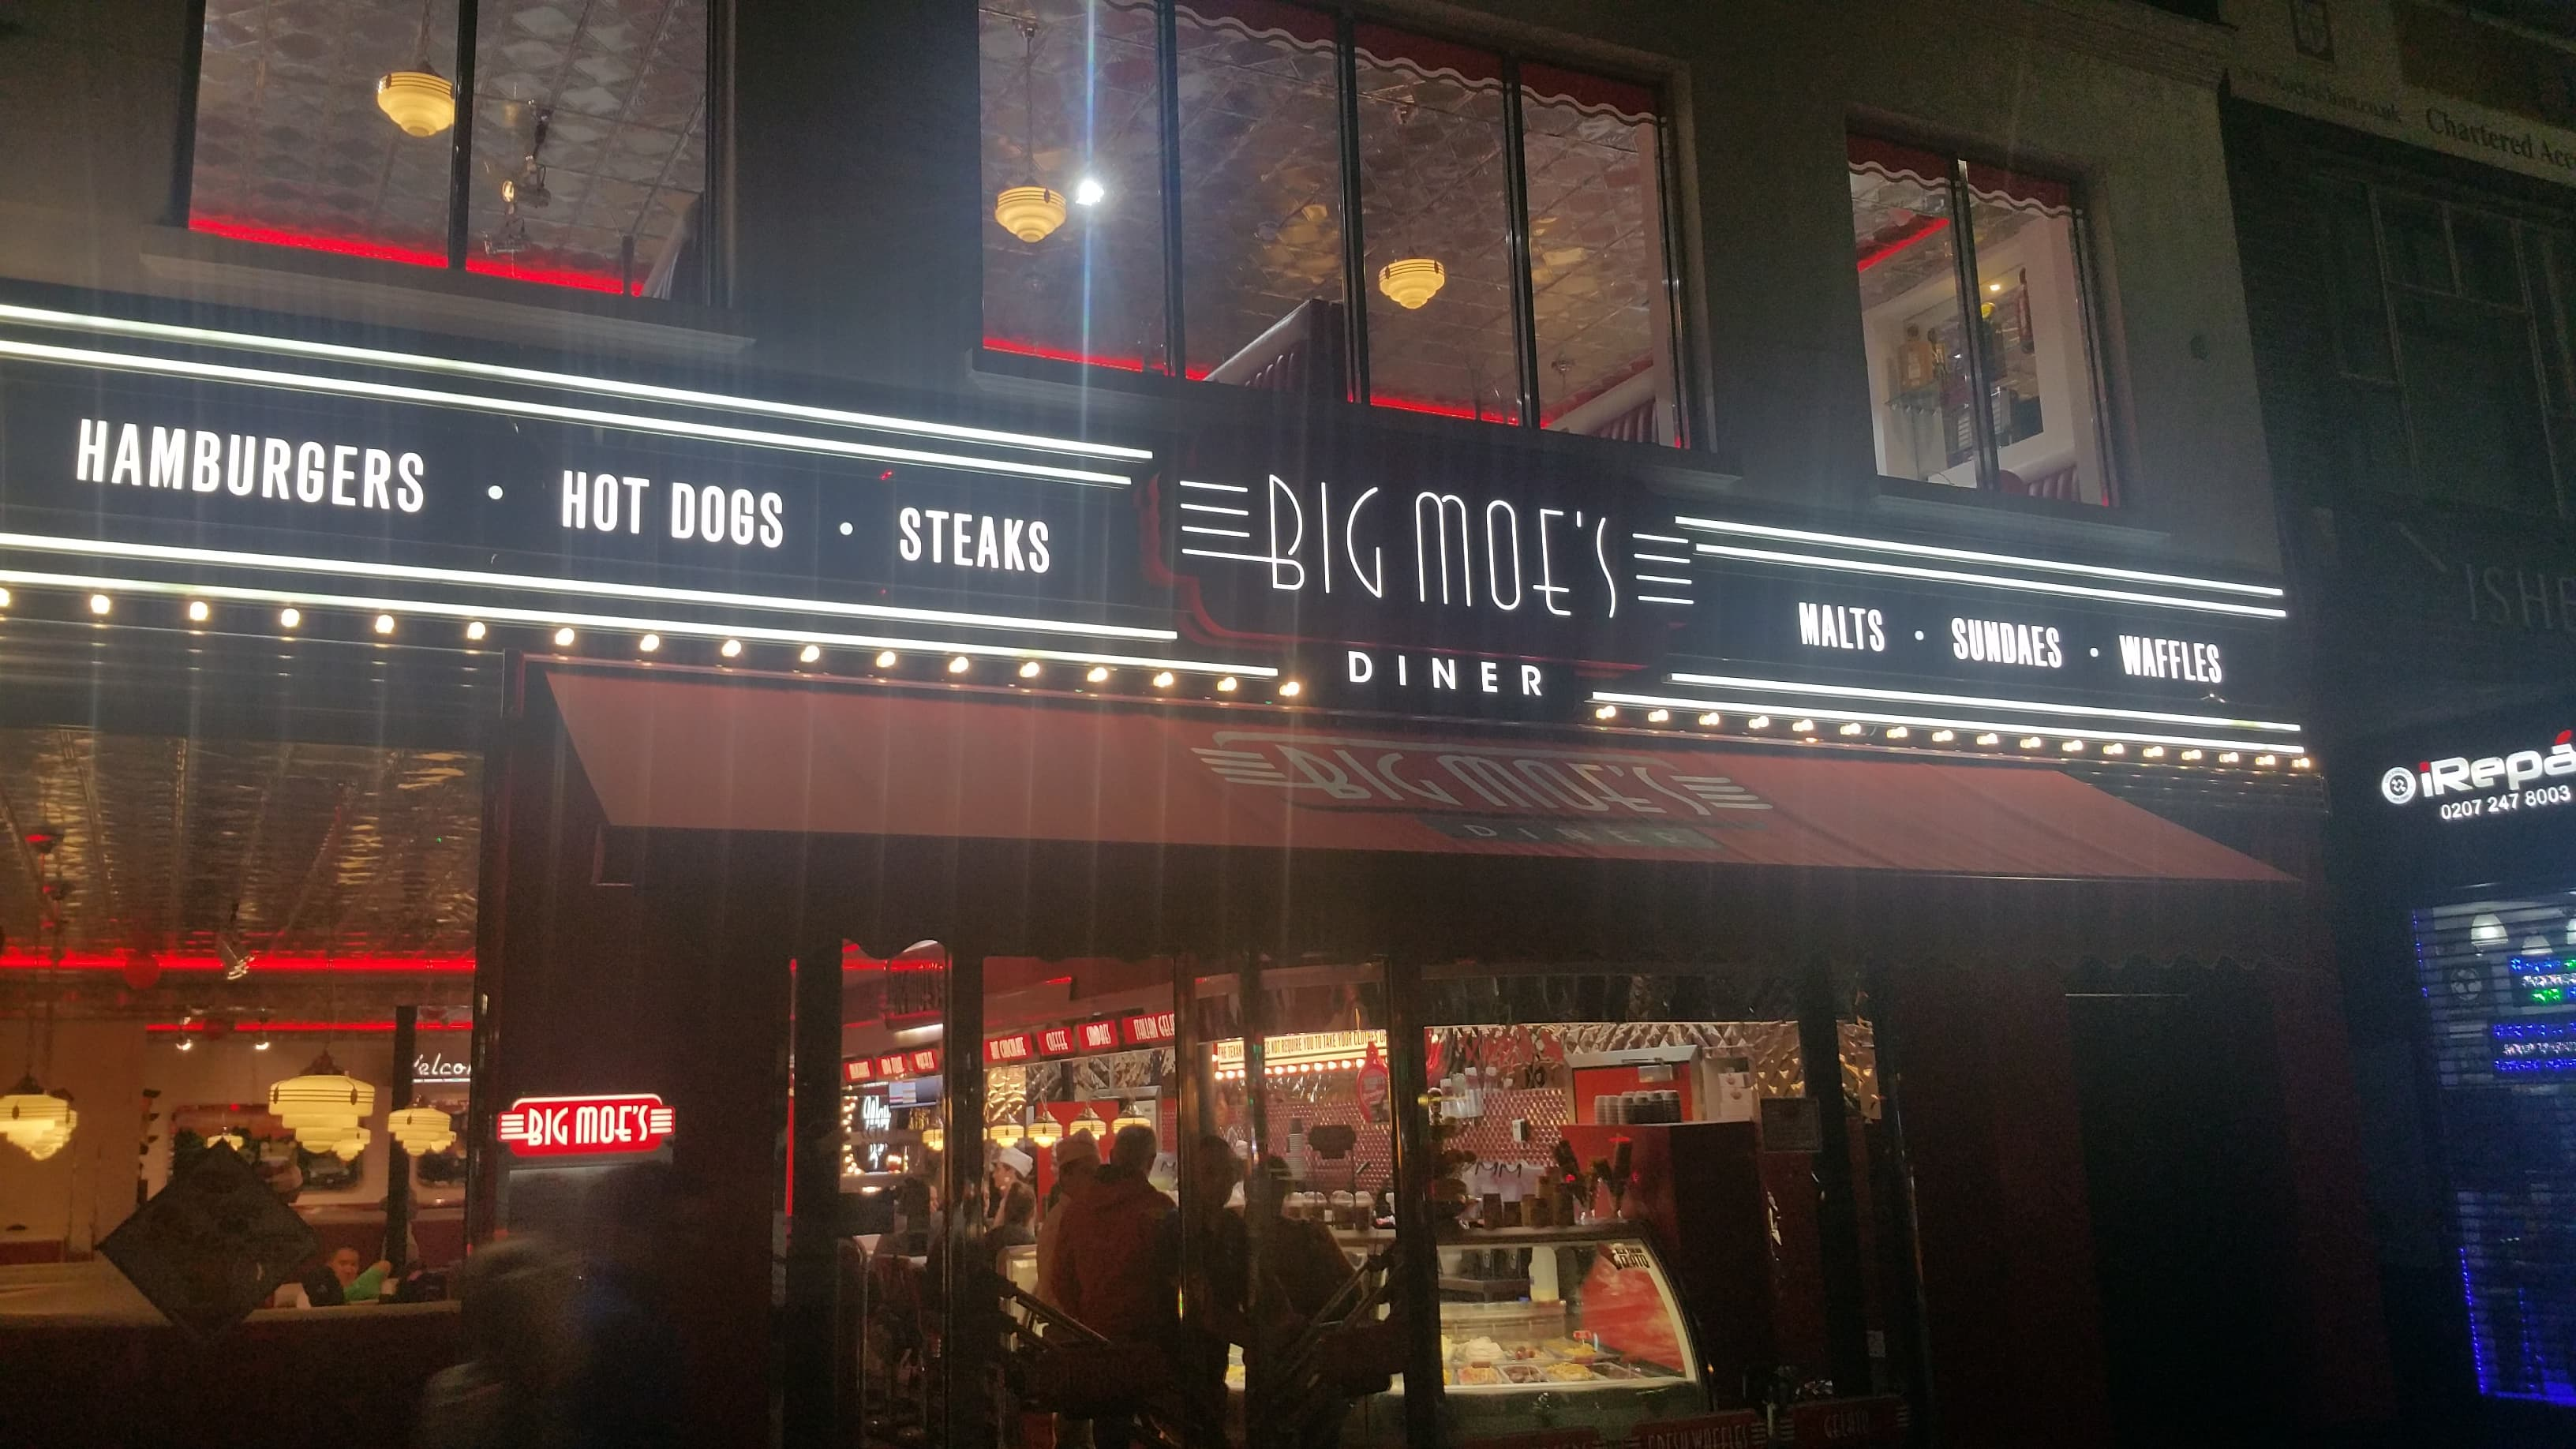 Big Moe's Diner - London London - HMC Certified Halal Food Gastronomy